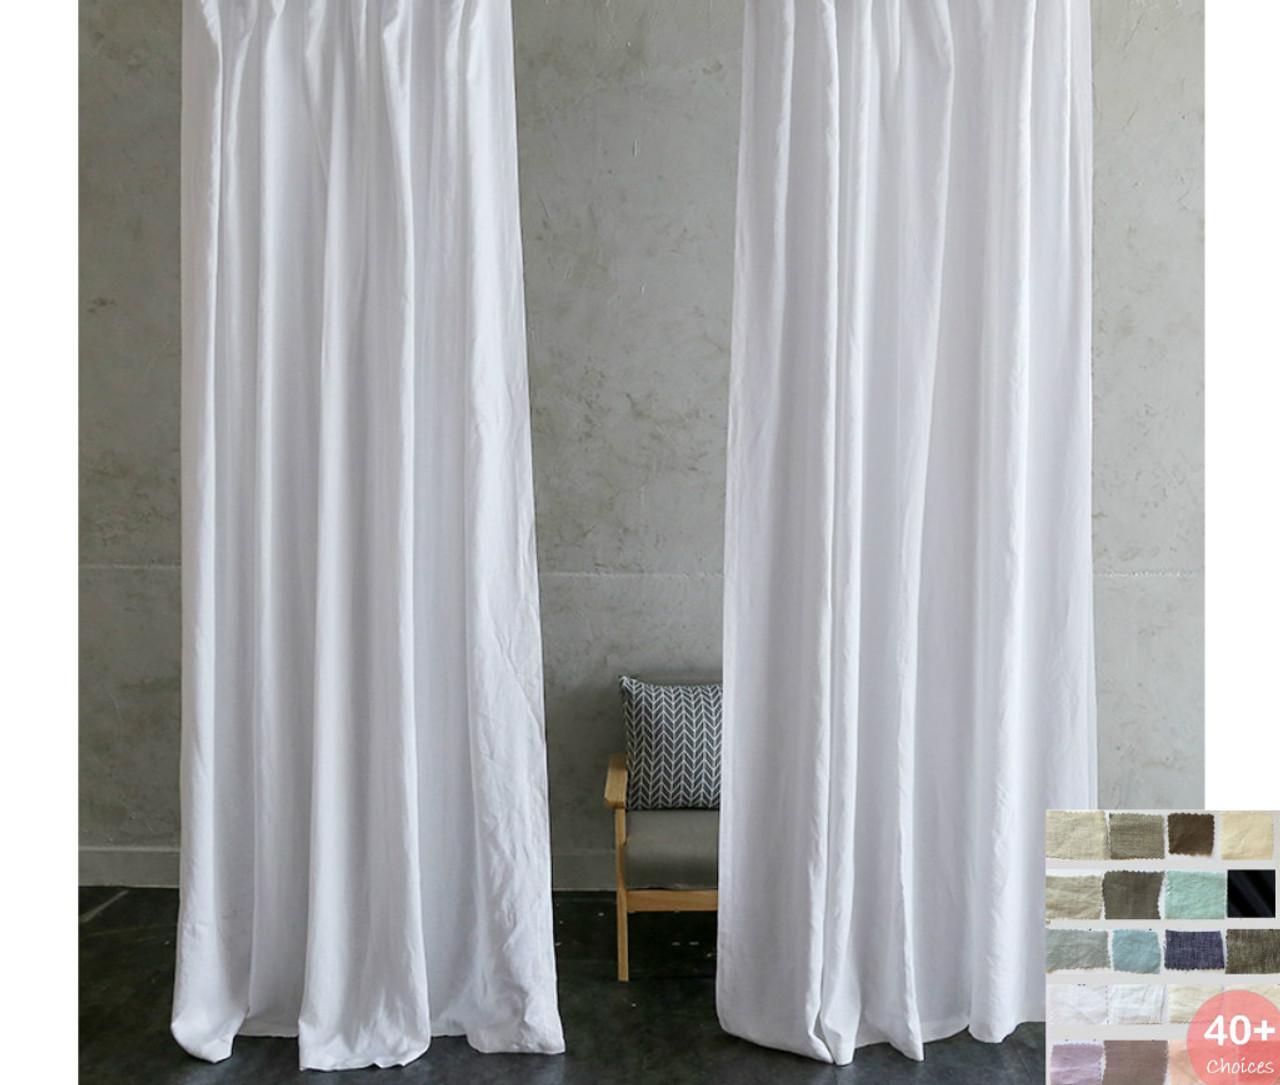 Custom Curtains, Linen Curtain Panels, - White, Grey, Cream, Pink